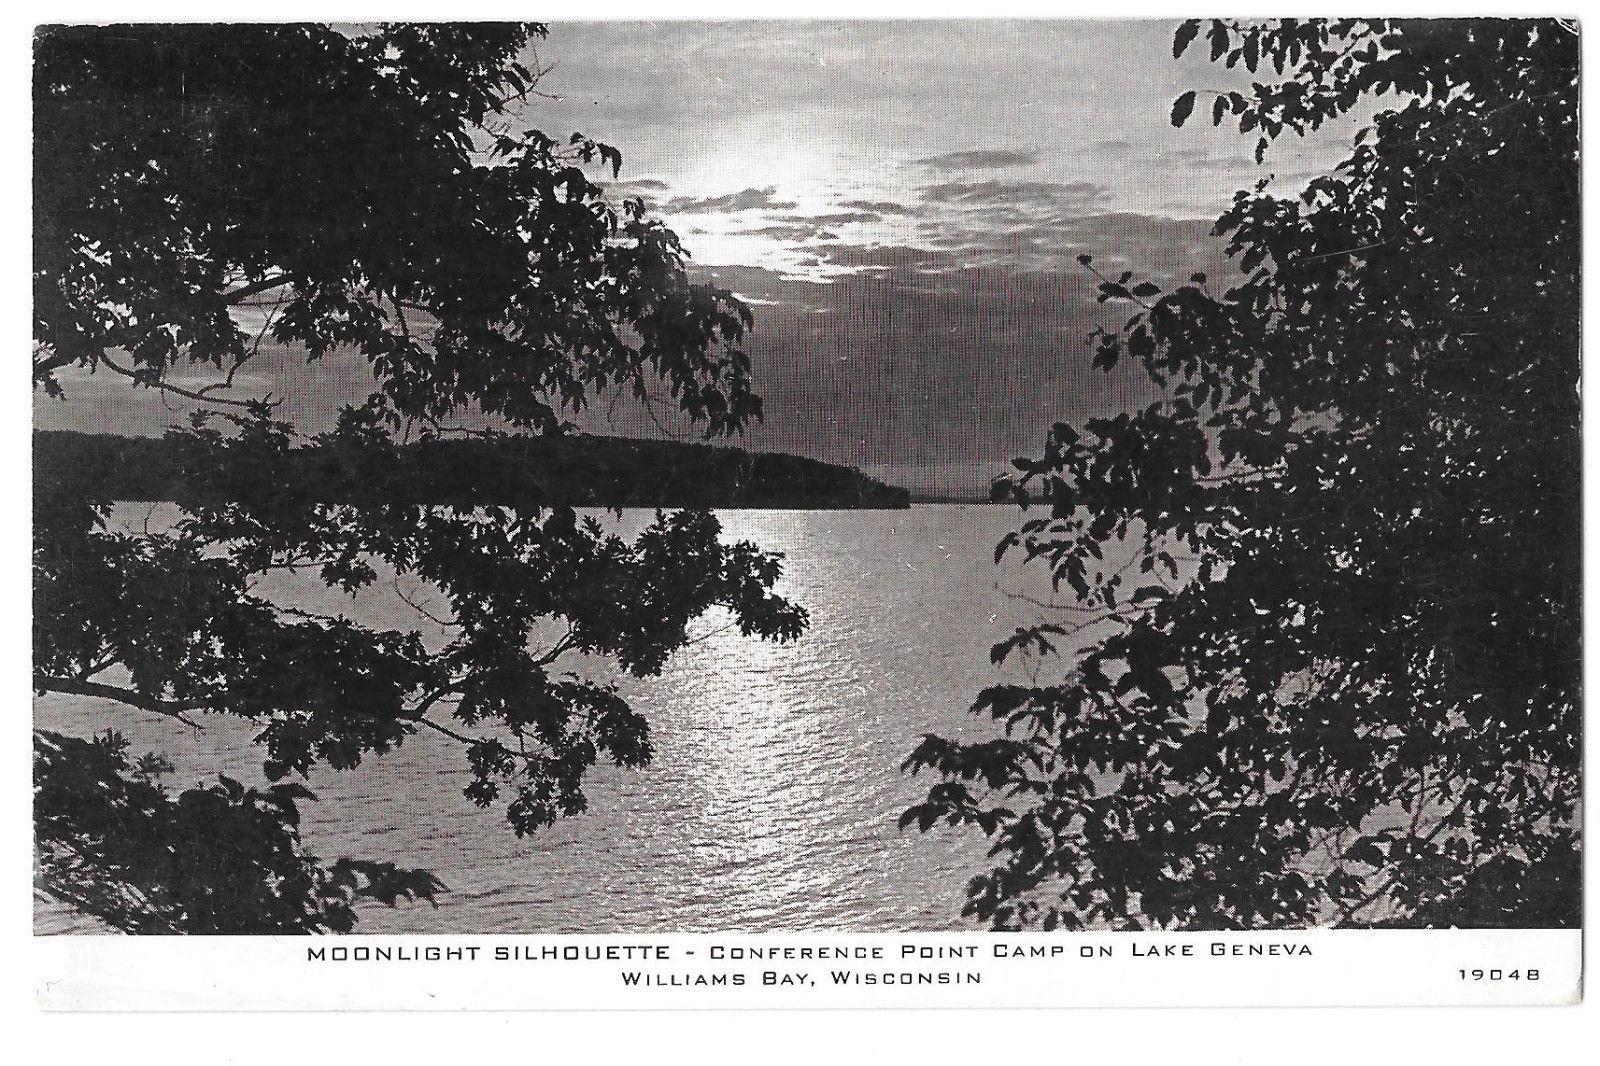 Williams Bay Wisconsin Moonlight Conference Point Camp Lake Geneva Vtg Postcard